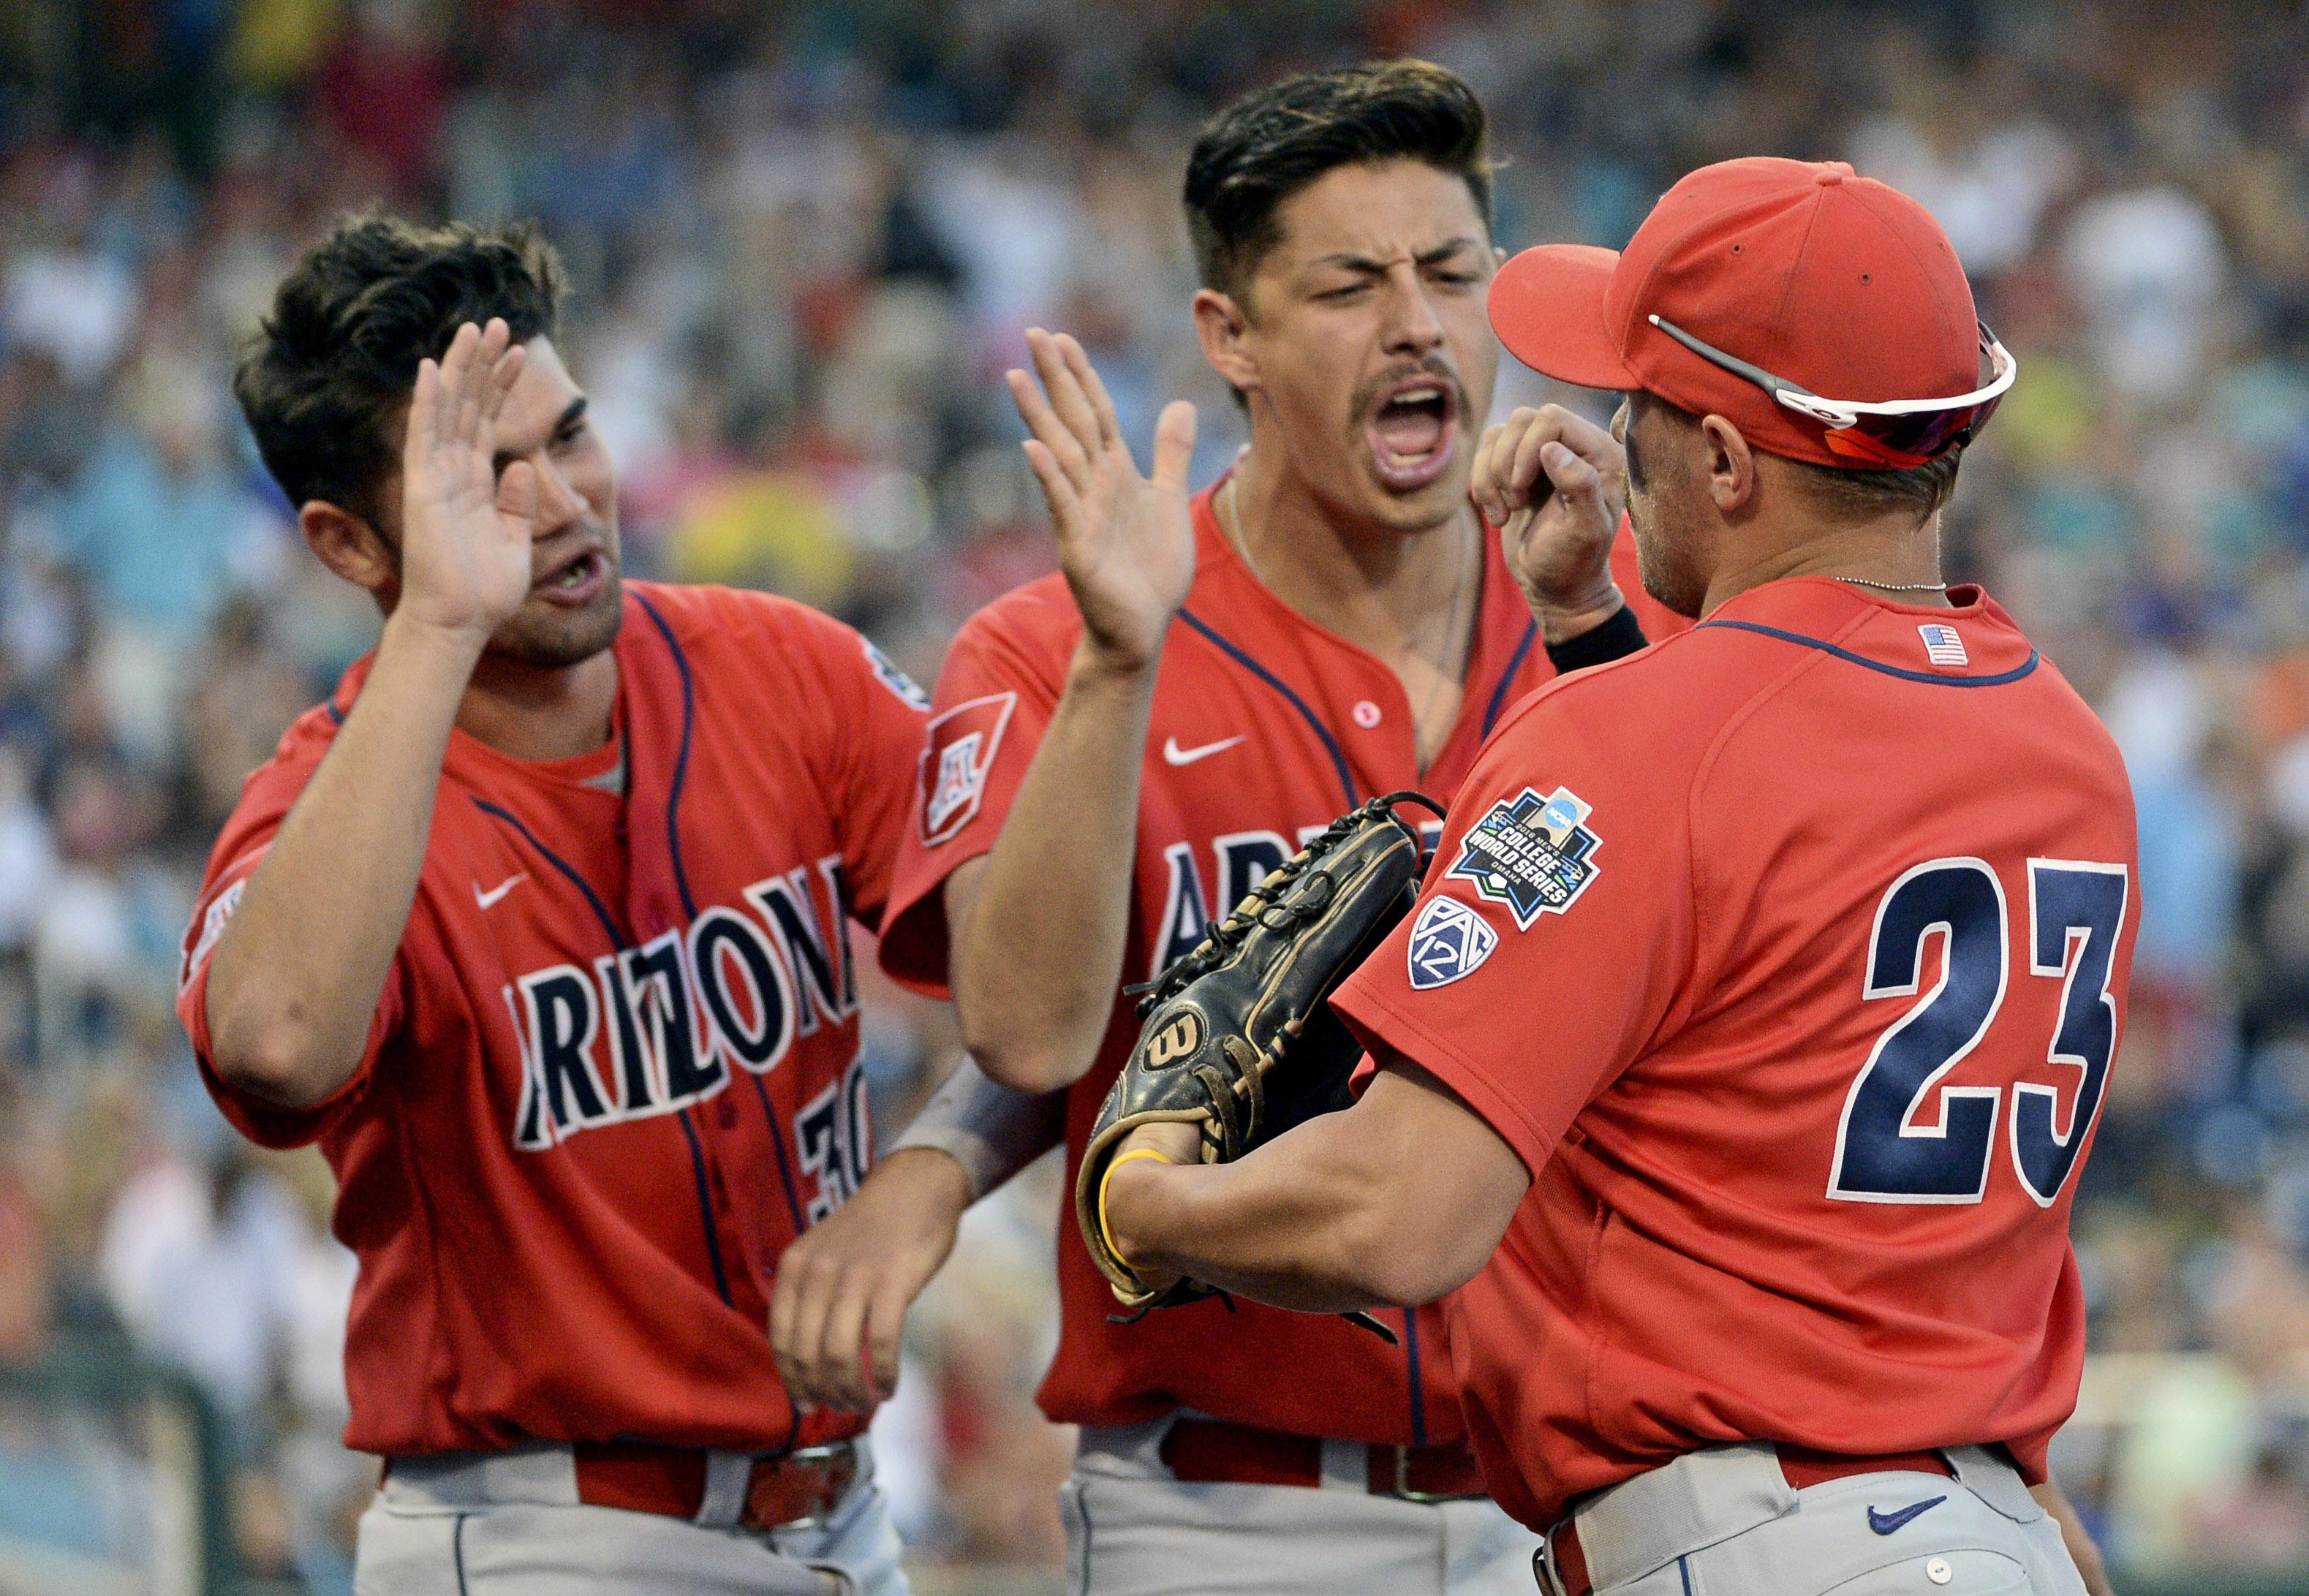 9358909-ncaa-baseball-college-world-series-arizona-vs-coastal-carolina